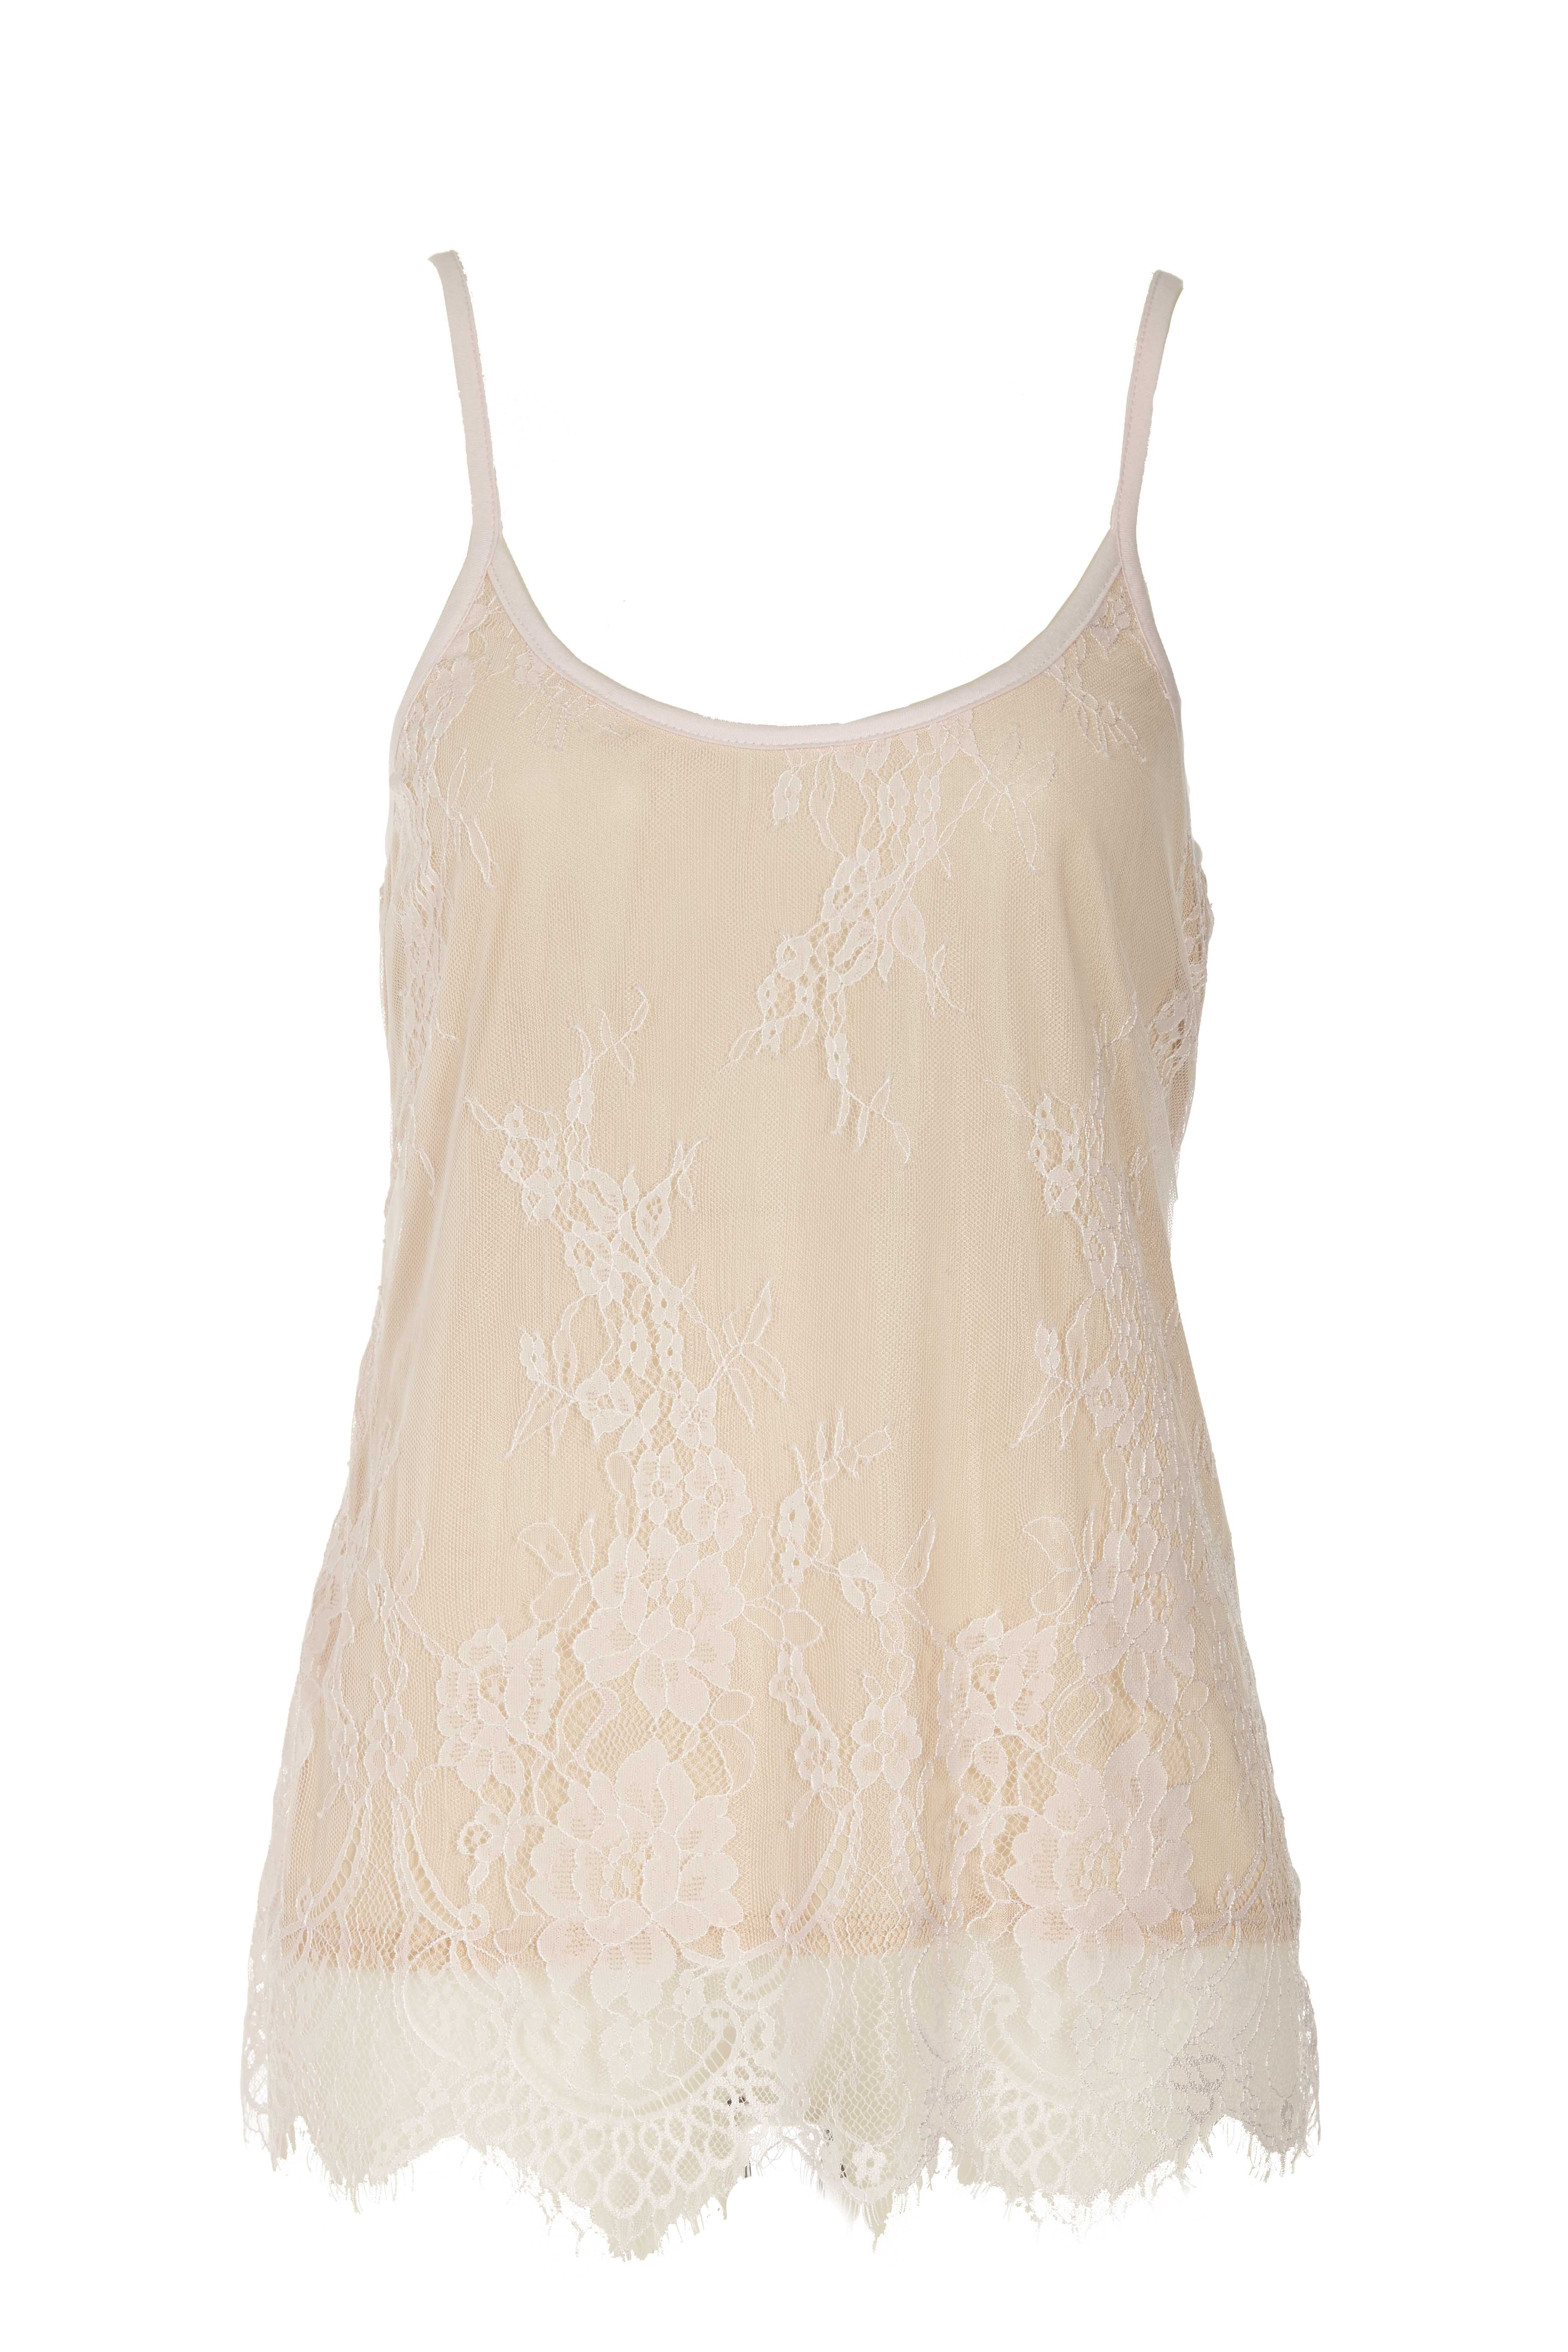 cotton-on-body_bridal-lace-tank_nz29-95_oct-nov-dec-2